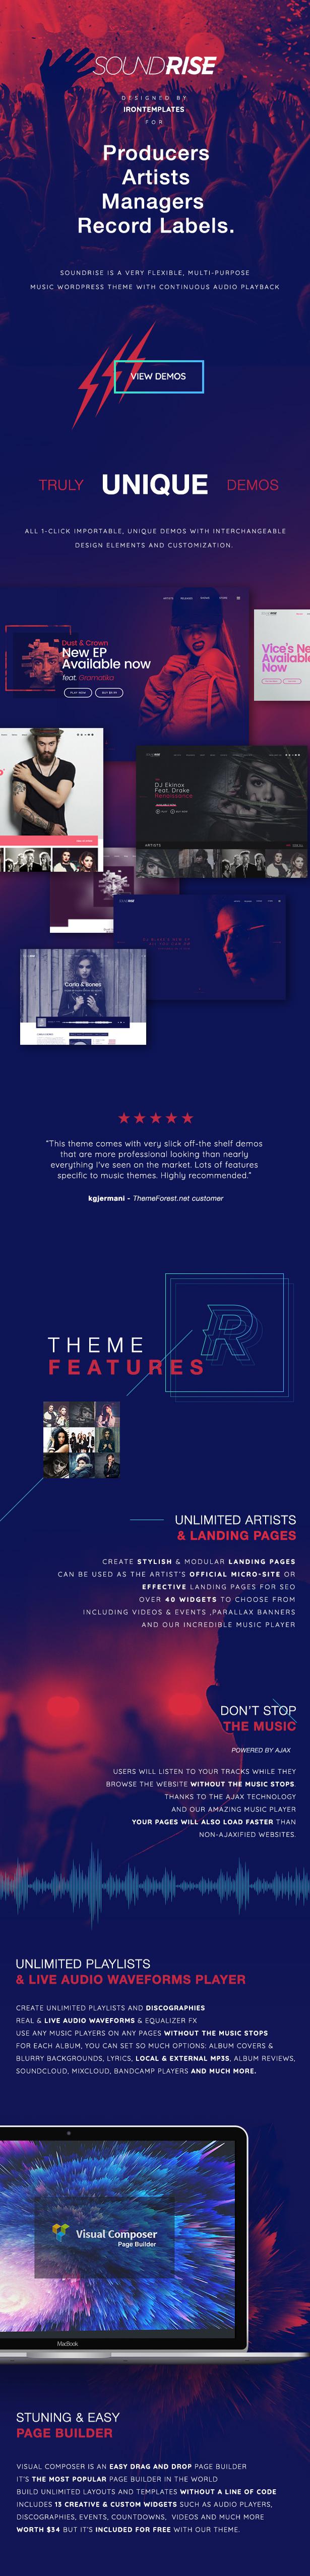 v3 it sr marketing tf  01 - SoundRise - Artists, Producers and Record Labels WordPress Theme